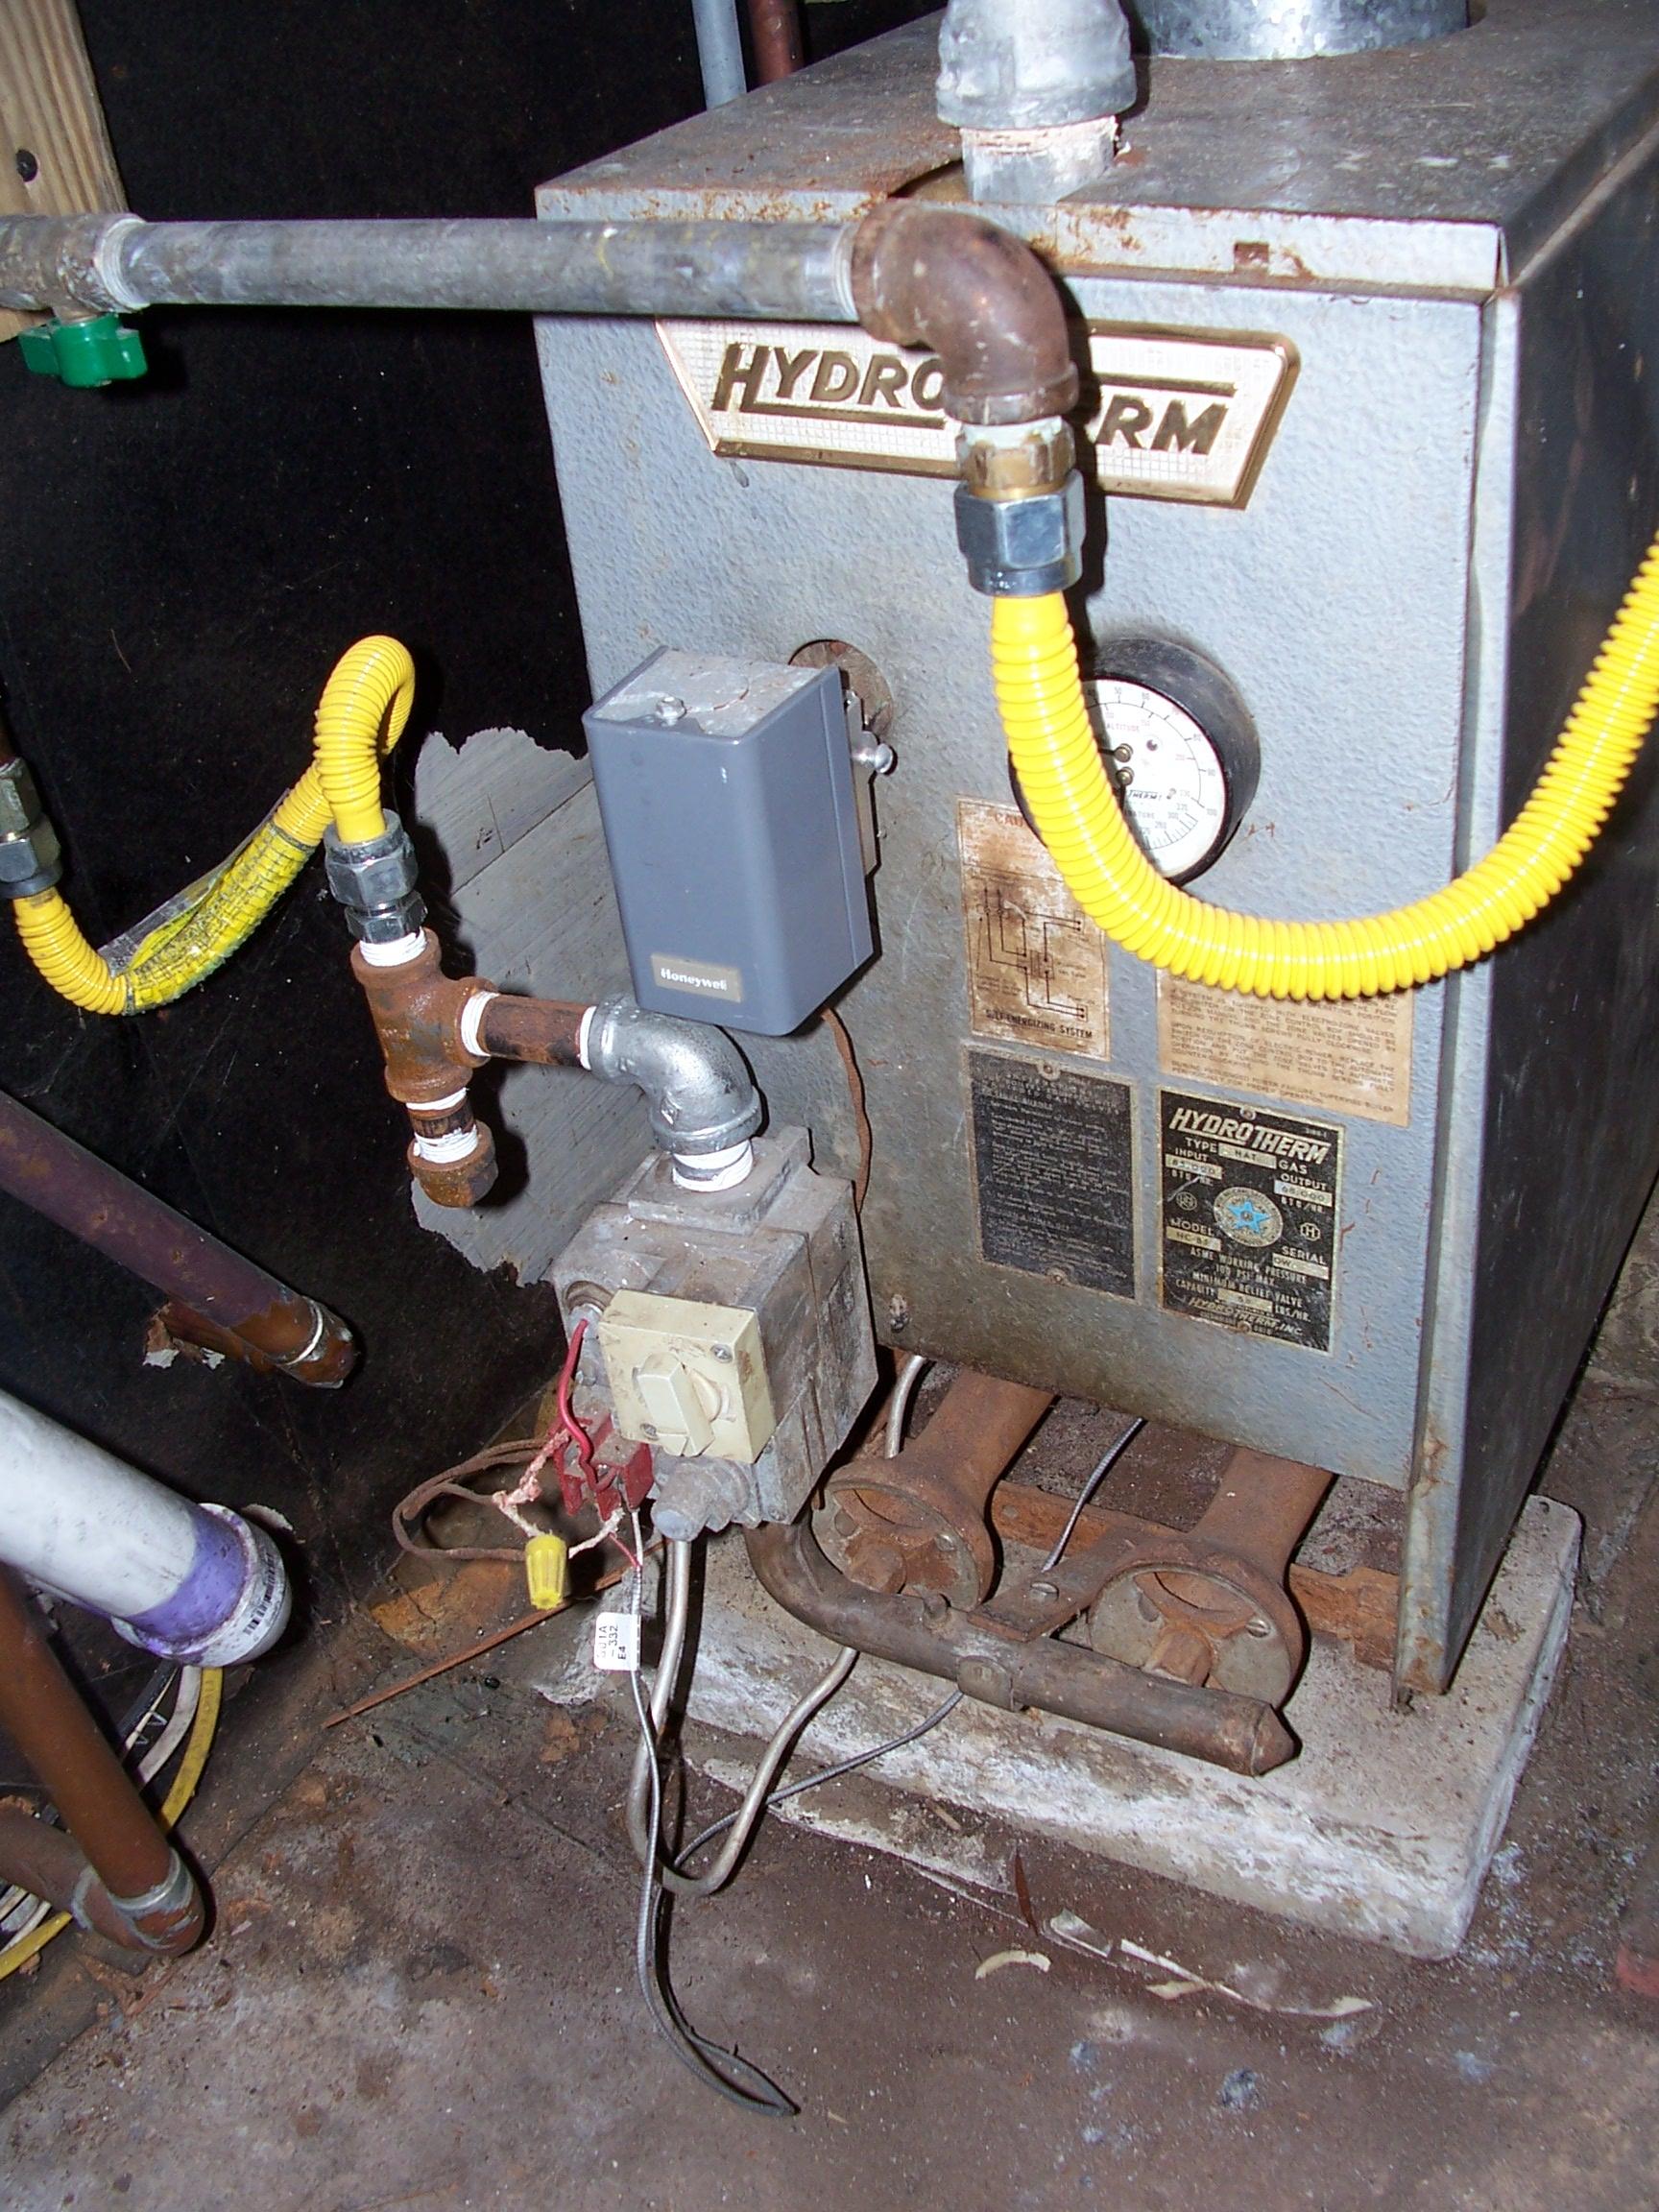 hydrotherm boiler wiring diagram wiring diagram blog hydrotherm boiler wiring diagram hydrotherm car